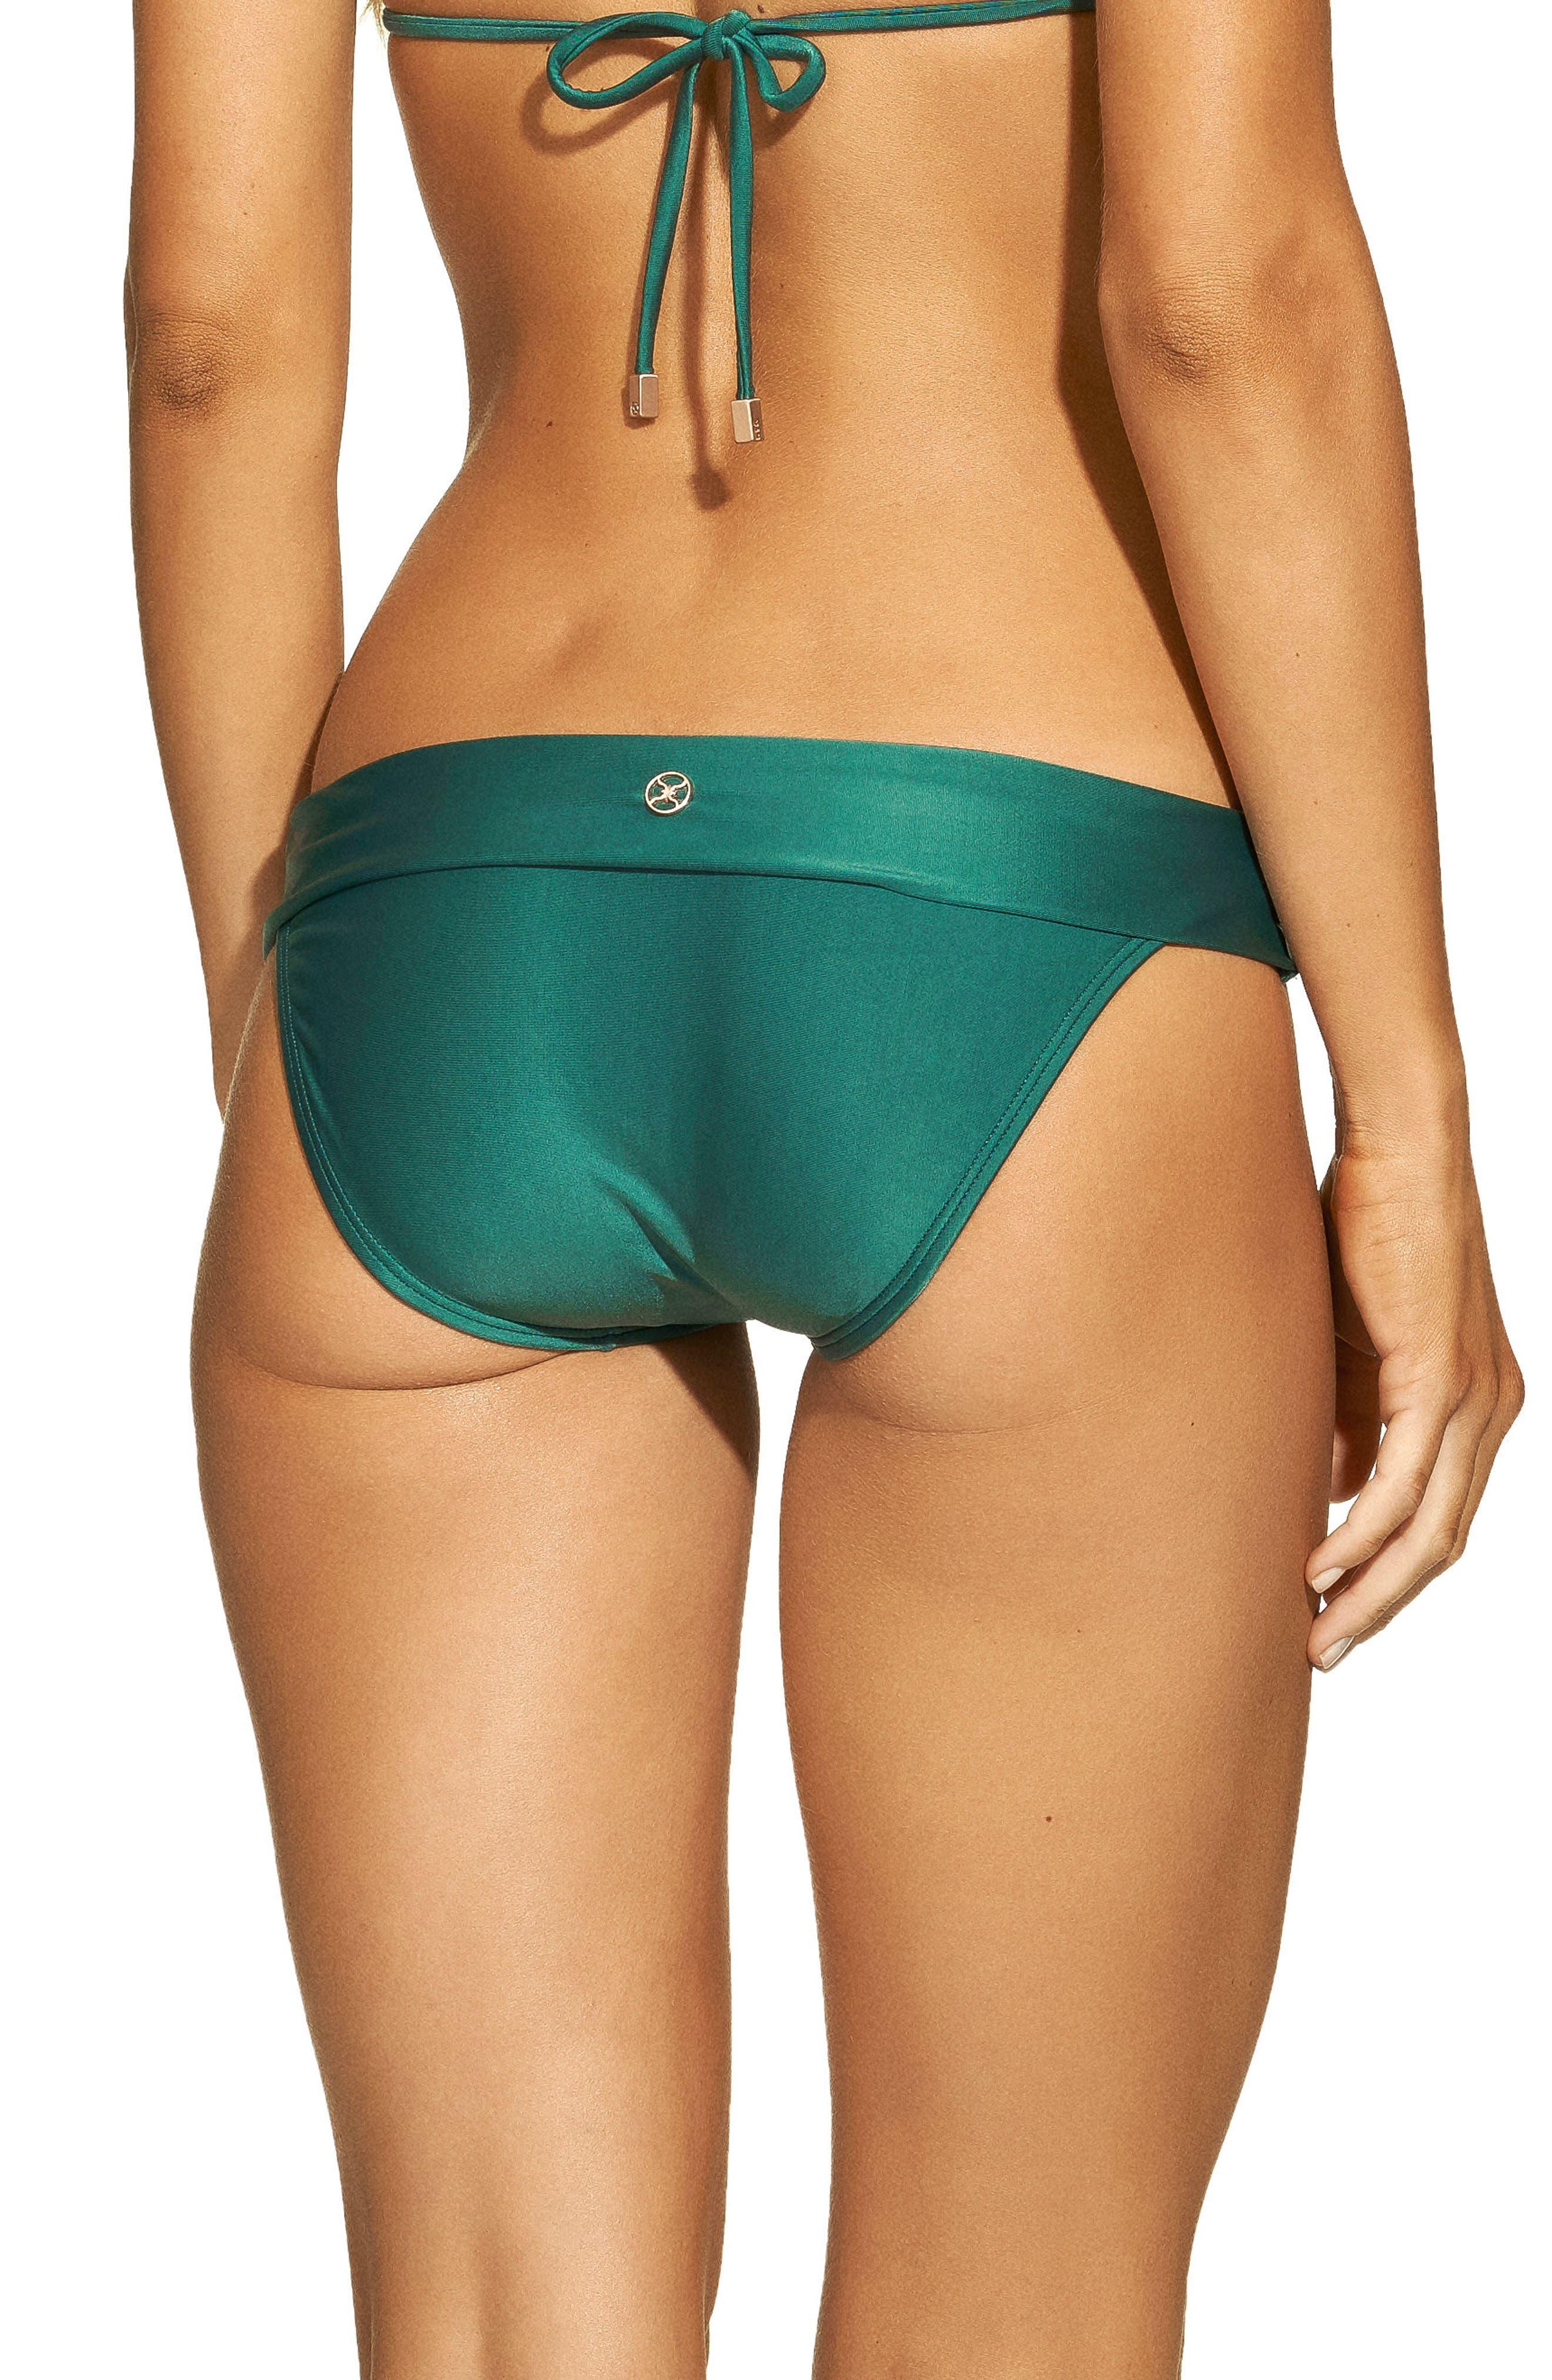 Jasper Bia Bikini Bottoms,                             Alternate thumbnail 2, color,                             Green